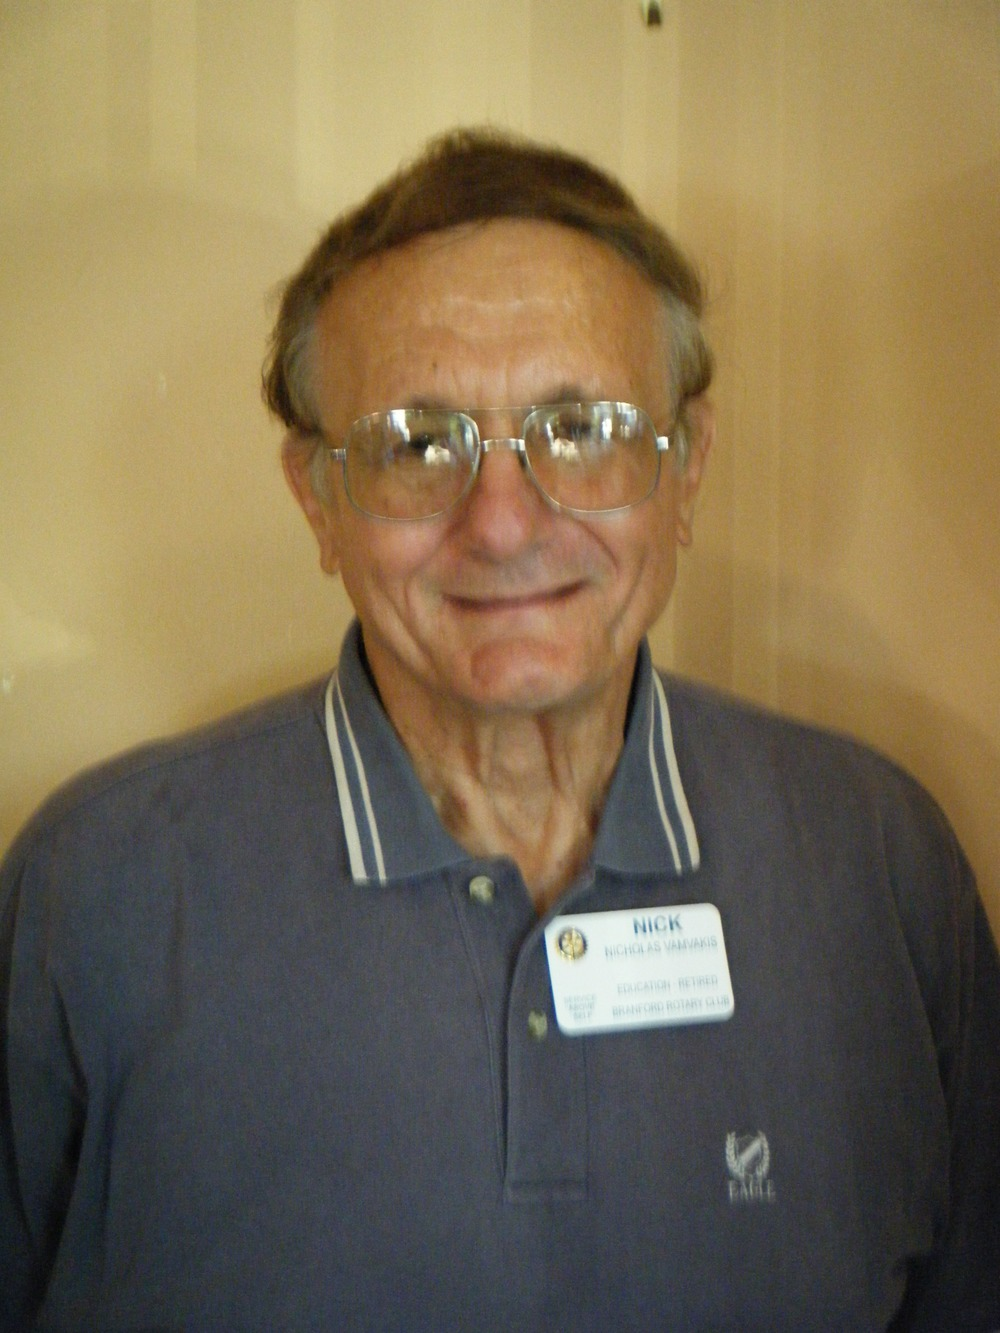 Nick Vamvakis<br>Teaching (Retired)